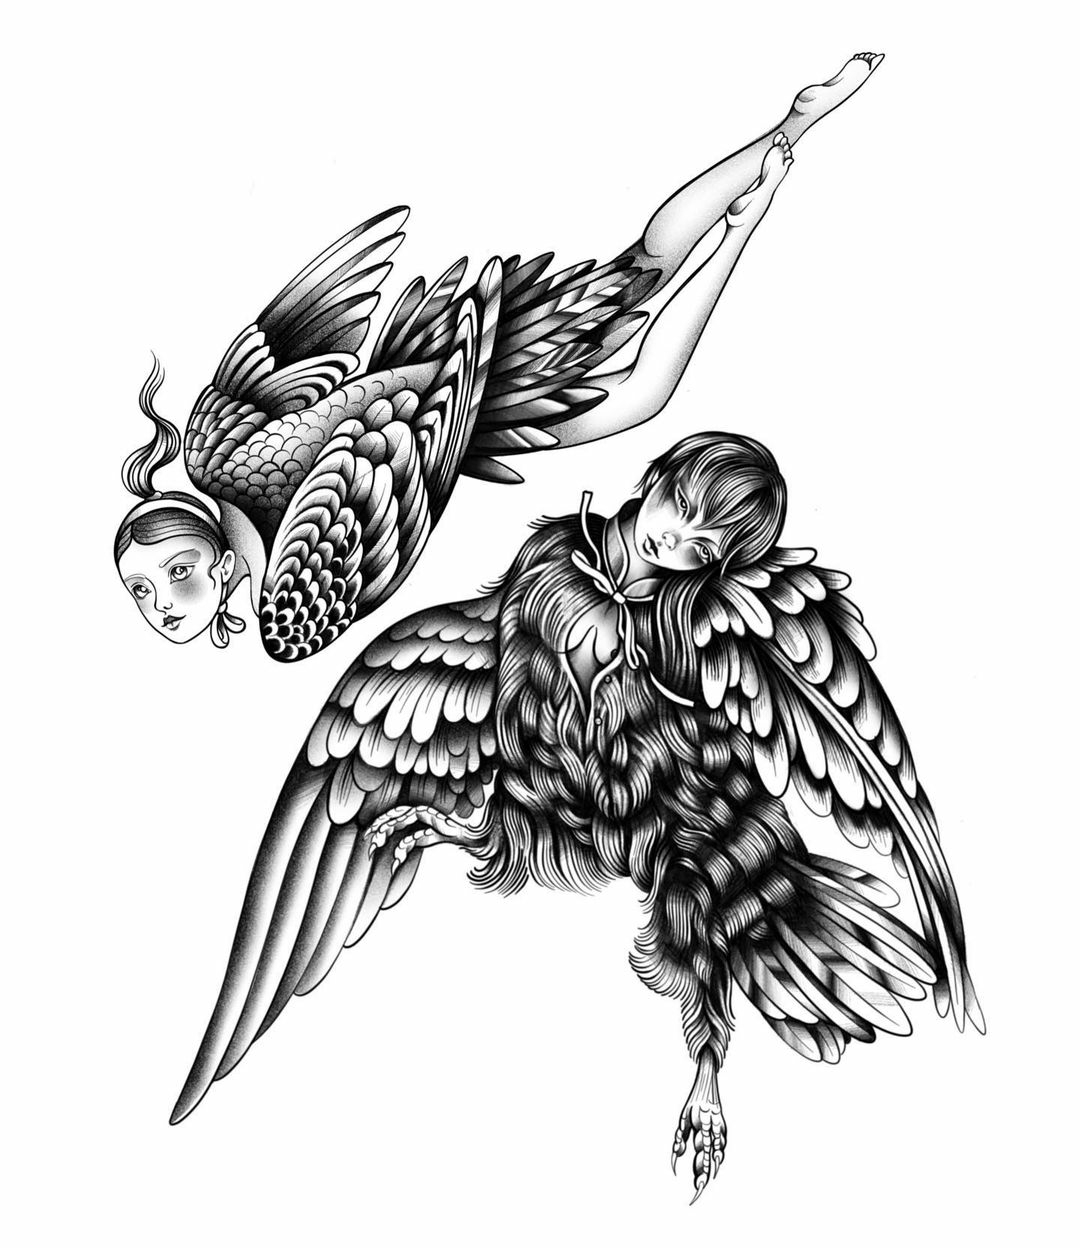 Inksearch tattoo Anna Szejdewik aka Coxie